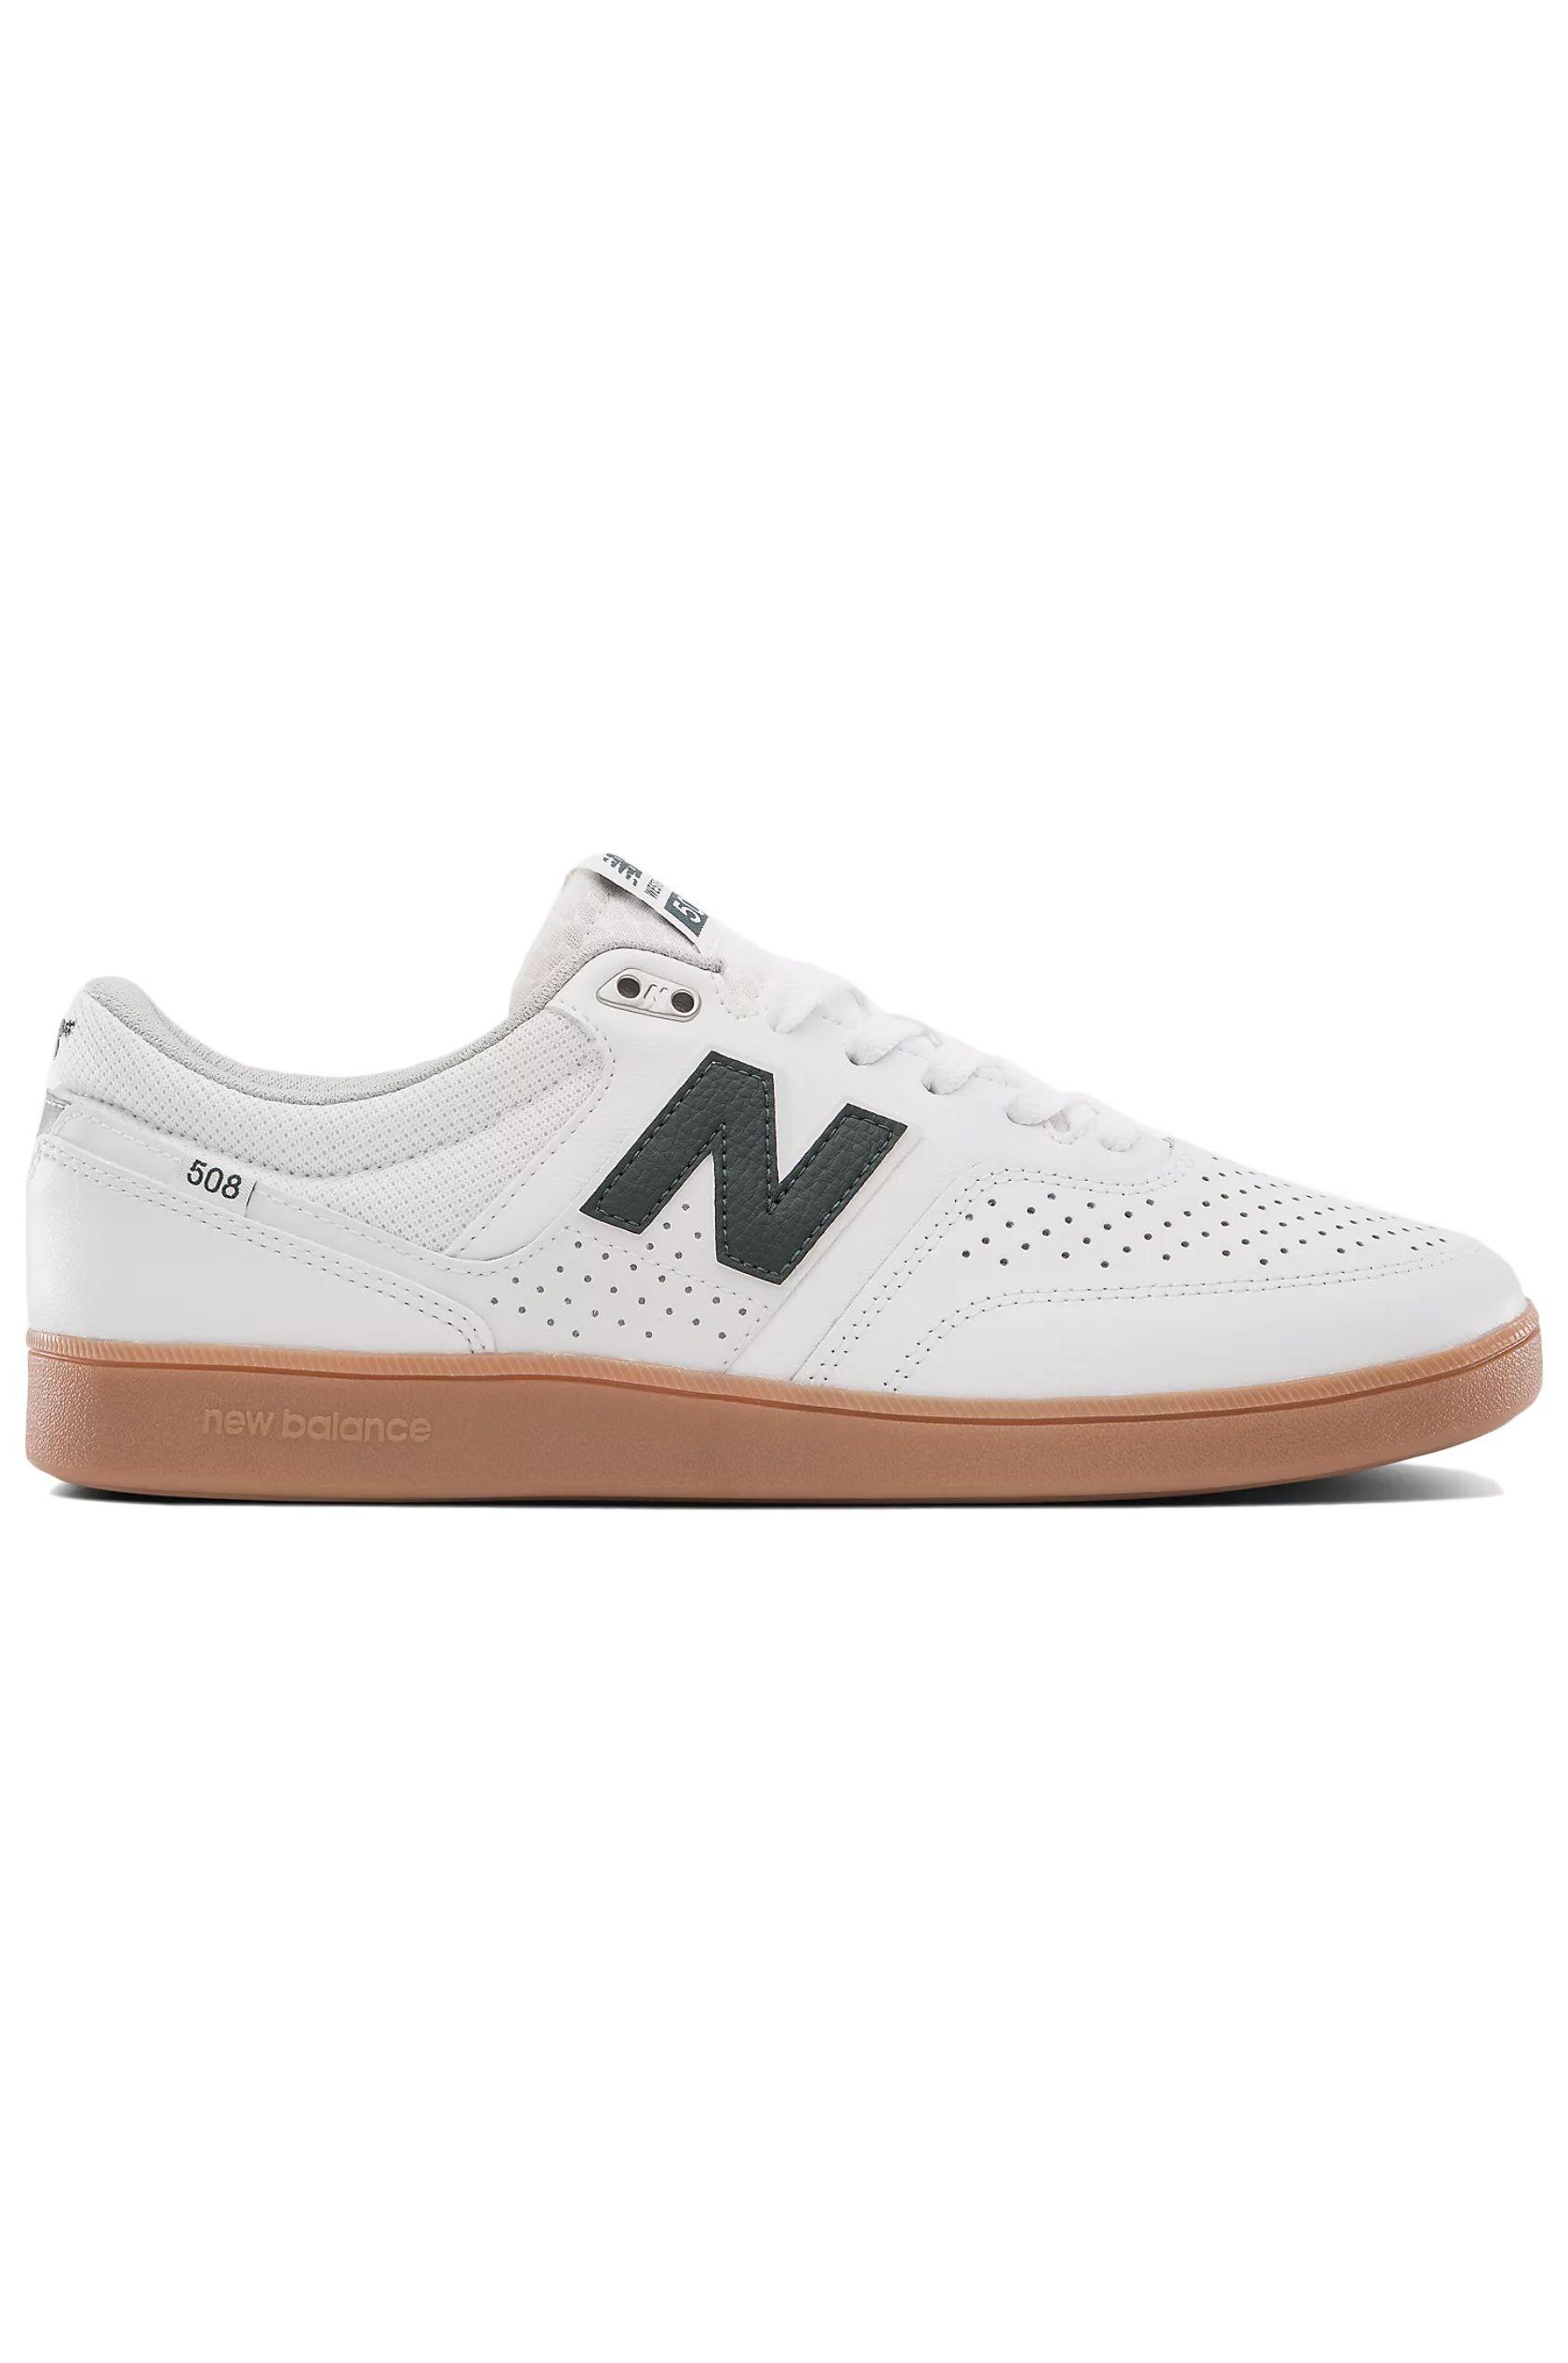 New Balance Shoes NM508 White